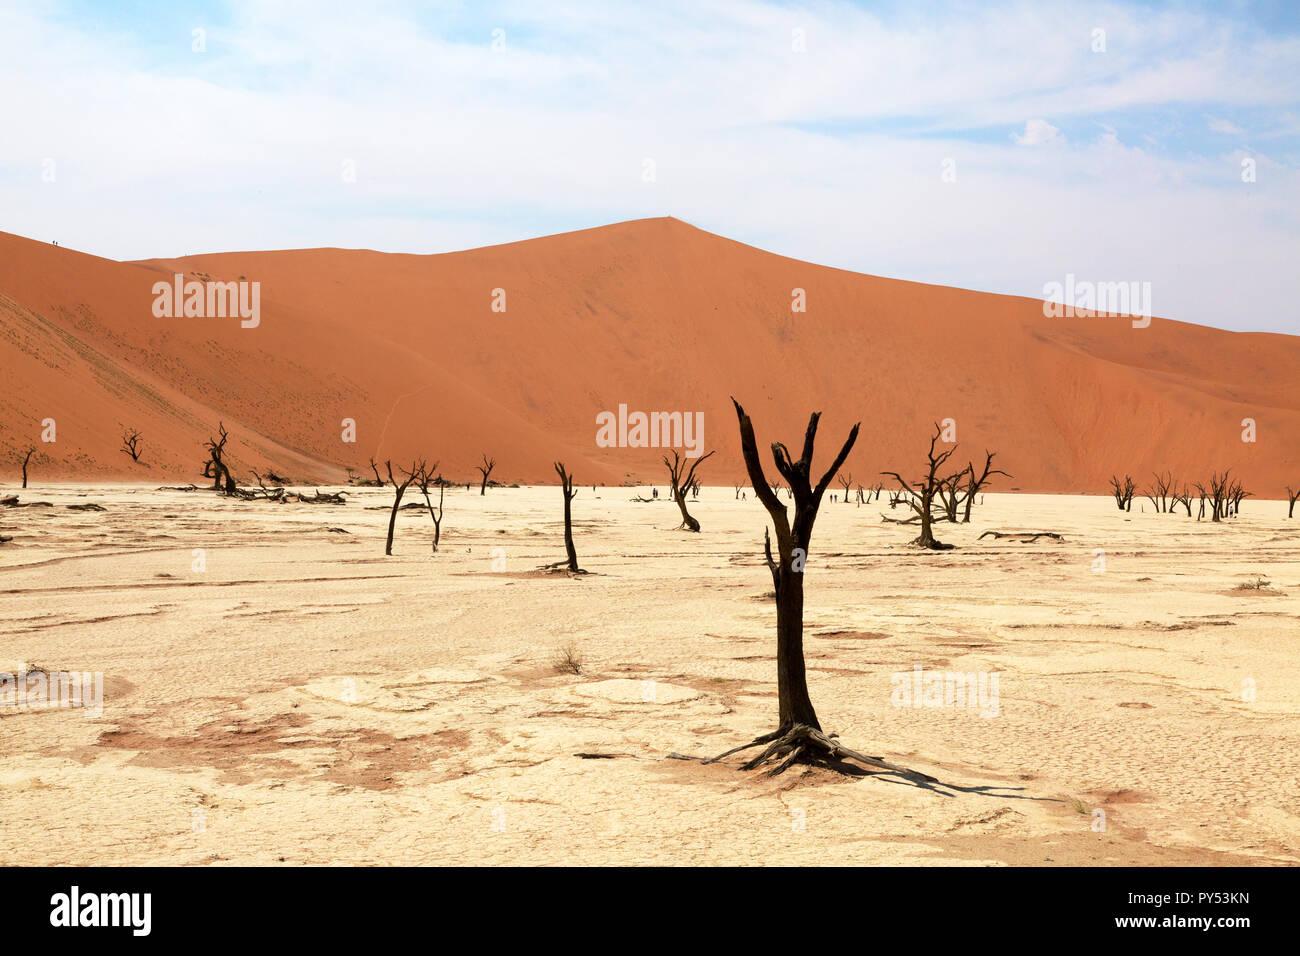 Deadvlei Namibia - desert landscape with trees dead for 8000 years in the dunes of the Namib Desert, Namib Naukluft National Park, Namibia Stock Photo